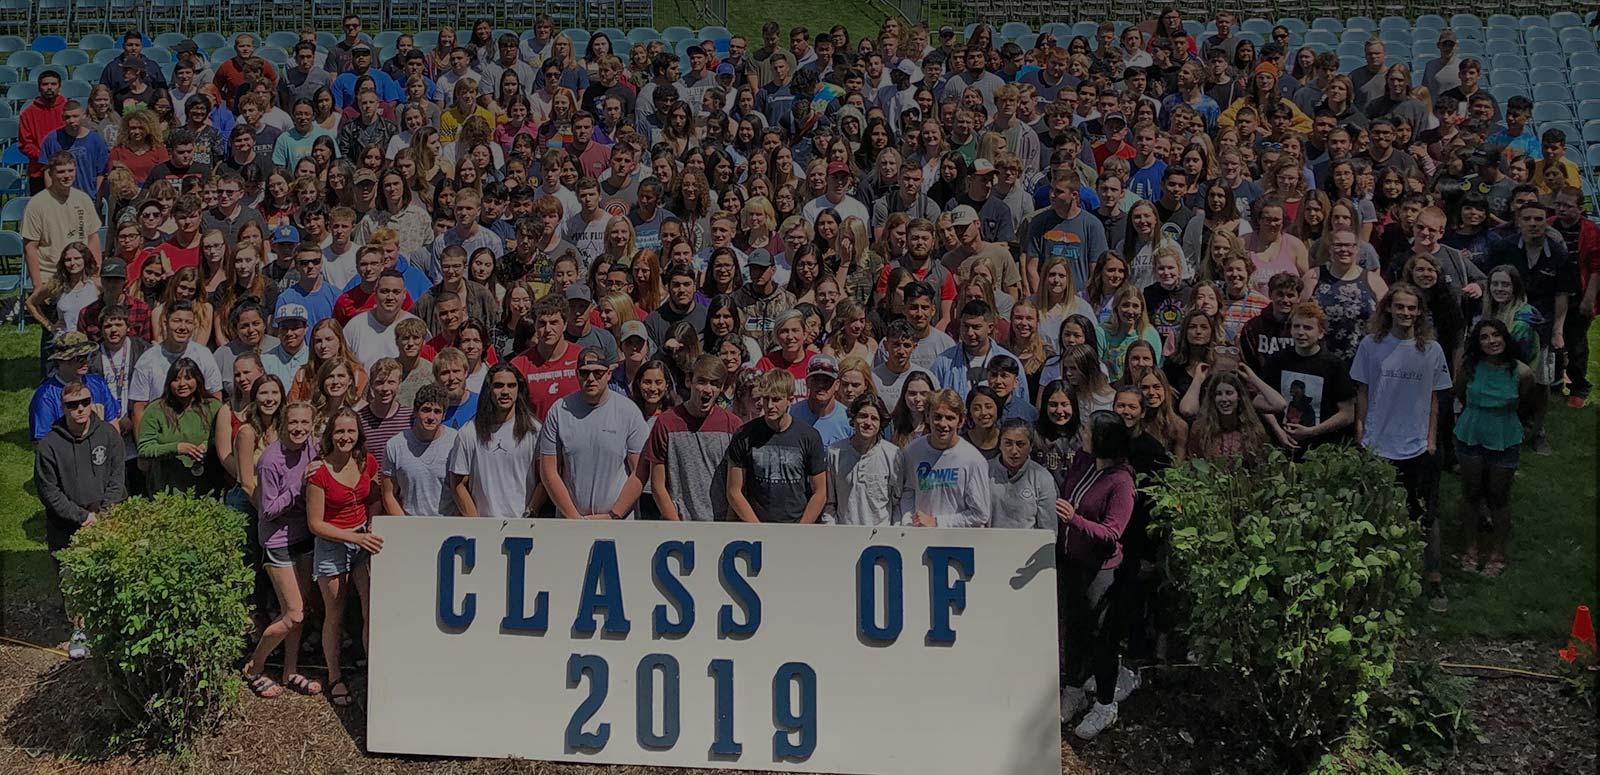 images/slideshow/wahi-graduates-2019.JPG